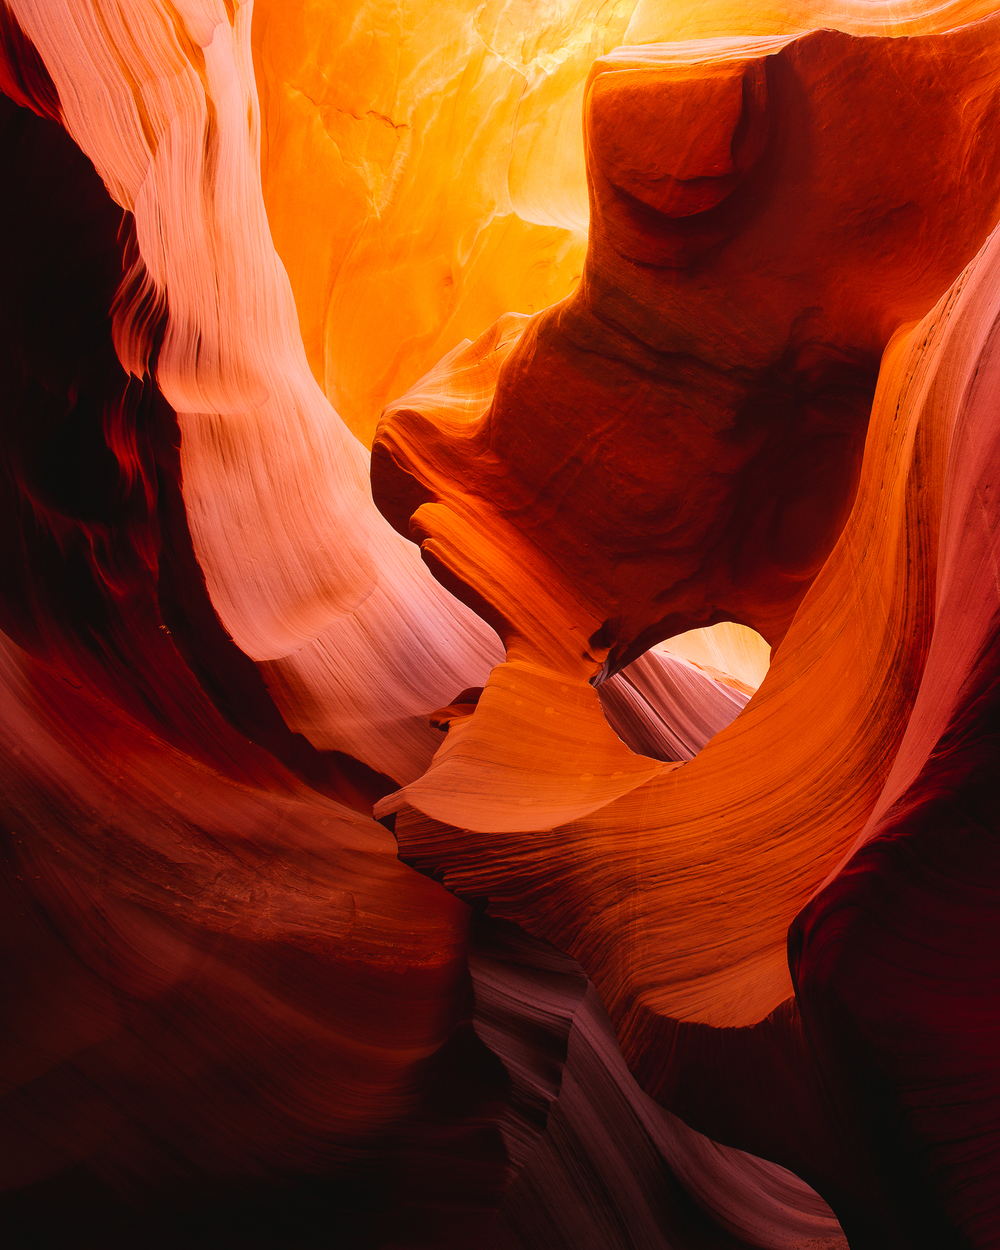 Navajo Indian Tribal Reservation, Slot Canyons, Arizona, USA